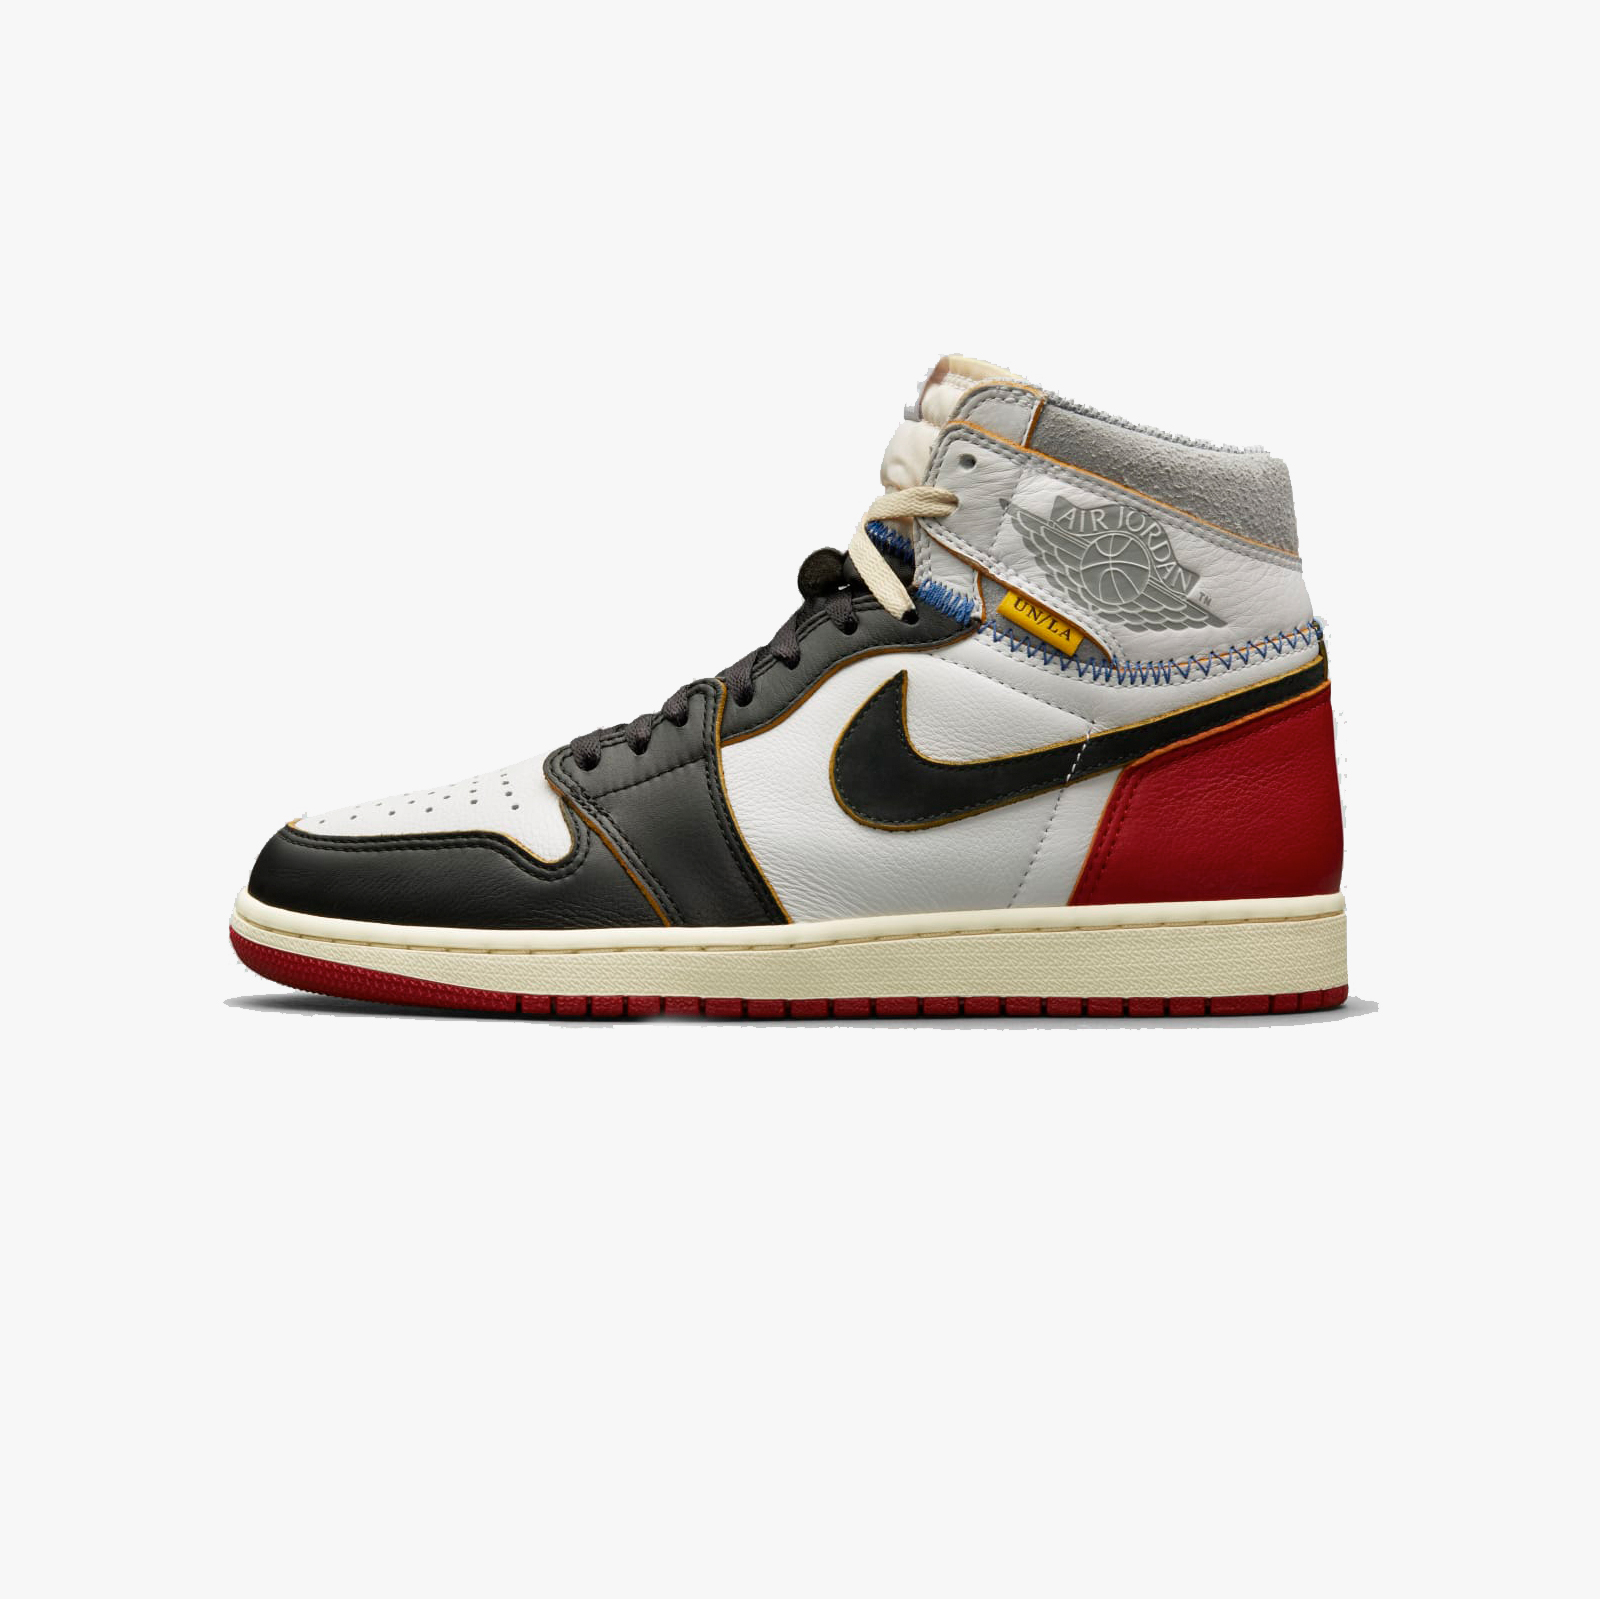 3138dccf57482a Jordan Brand Air Jordan 1 Retro Hi NRG   Union - Bv1300-106 -  Sneakersnstuff